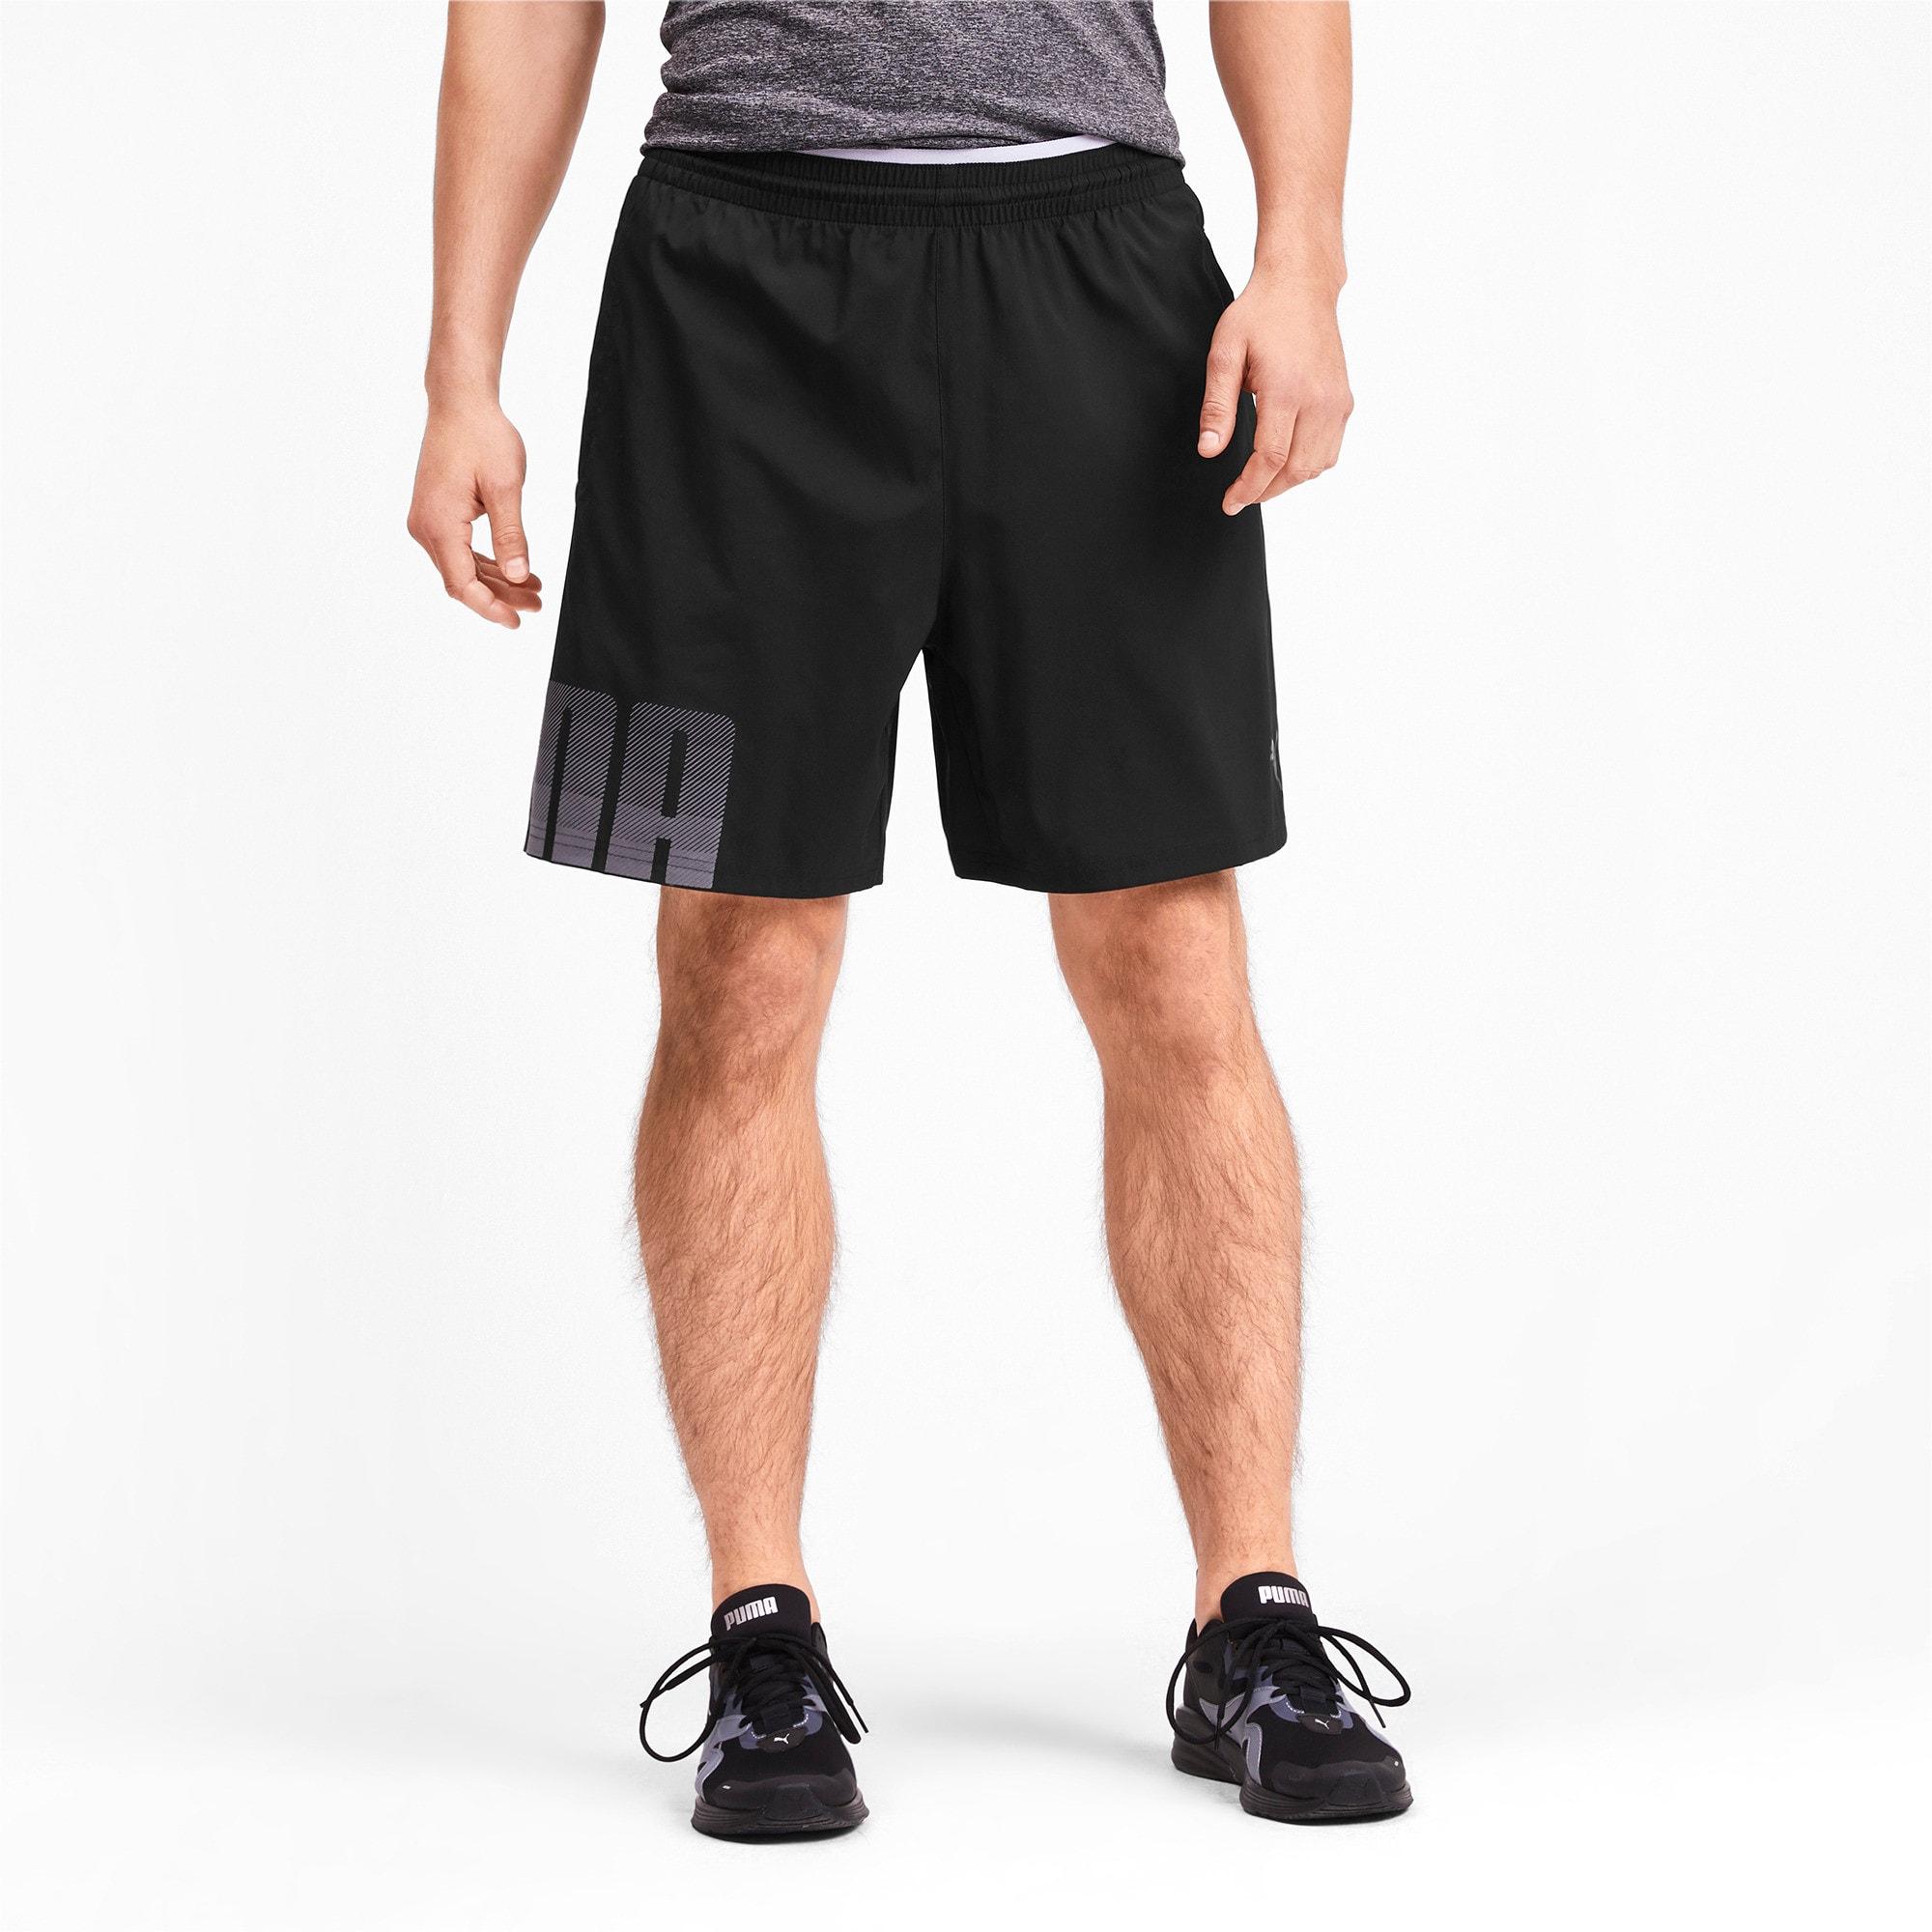 Thumbnail 1 of Collective Woven Men's Training Shorts, Puma Black, medium